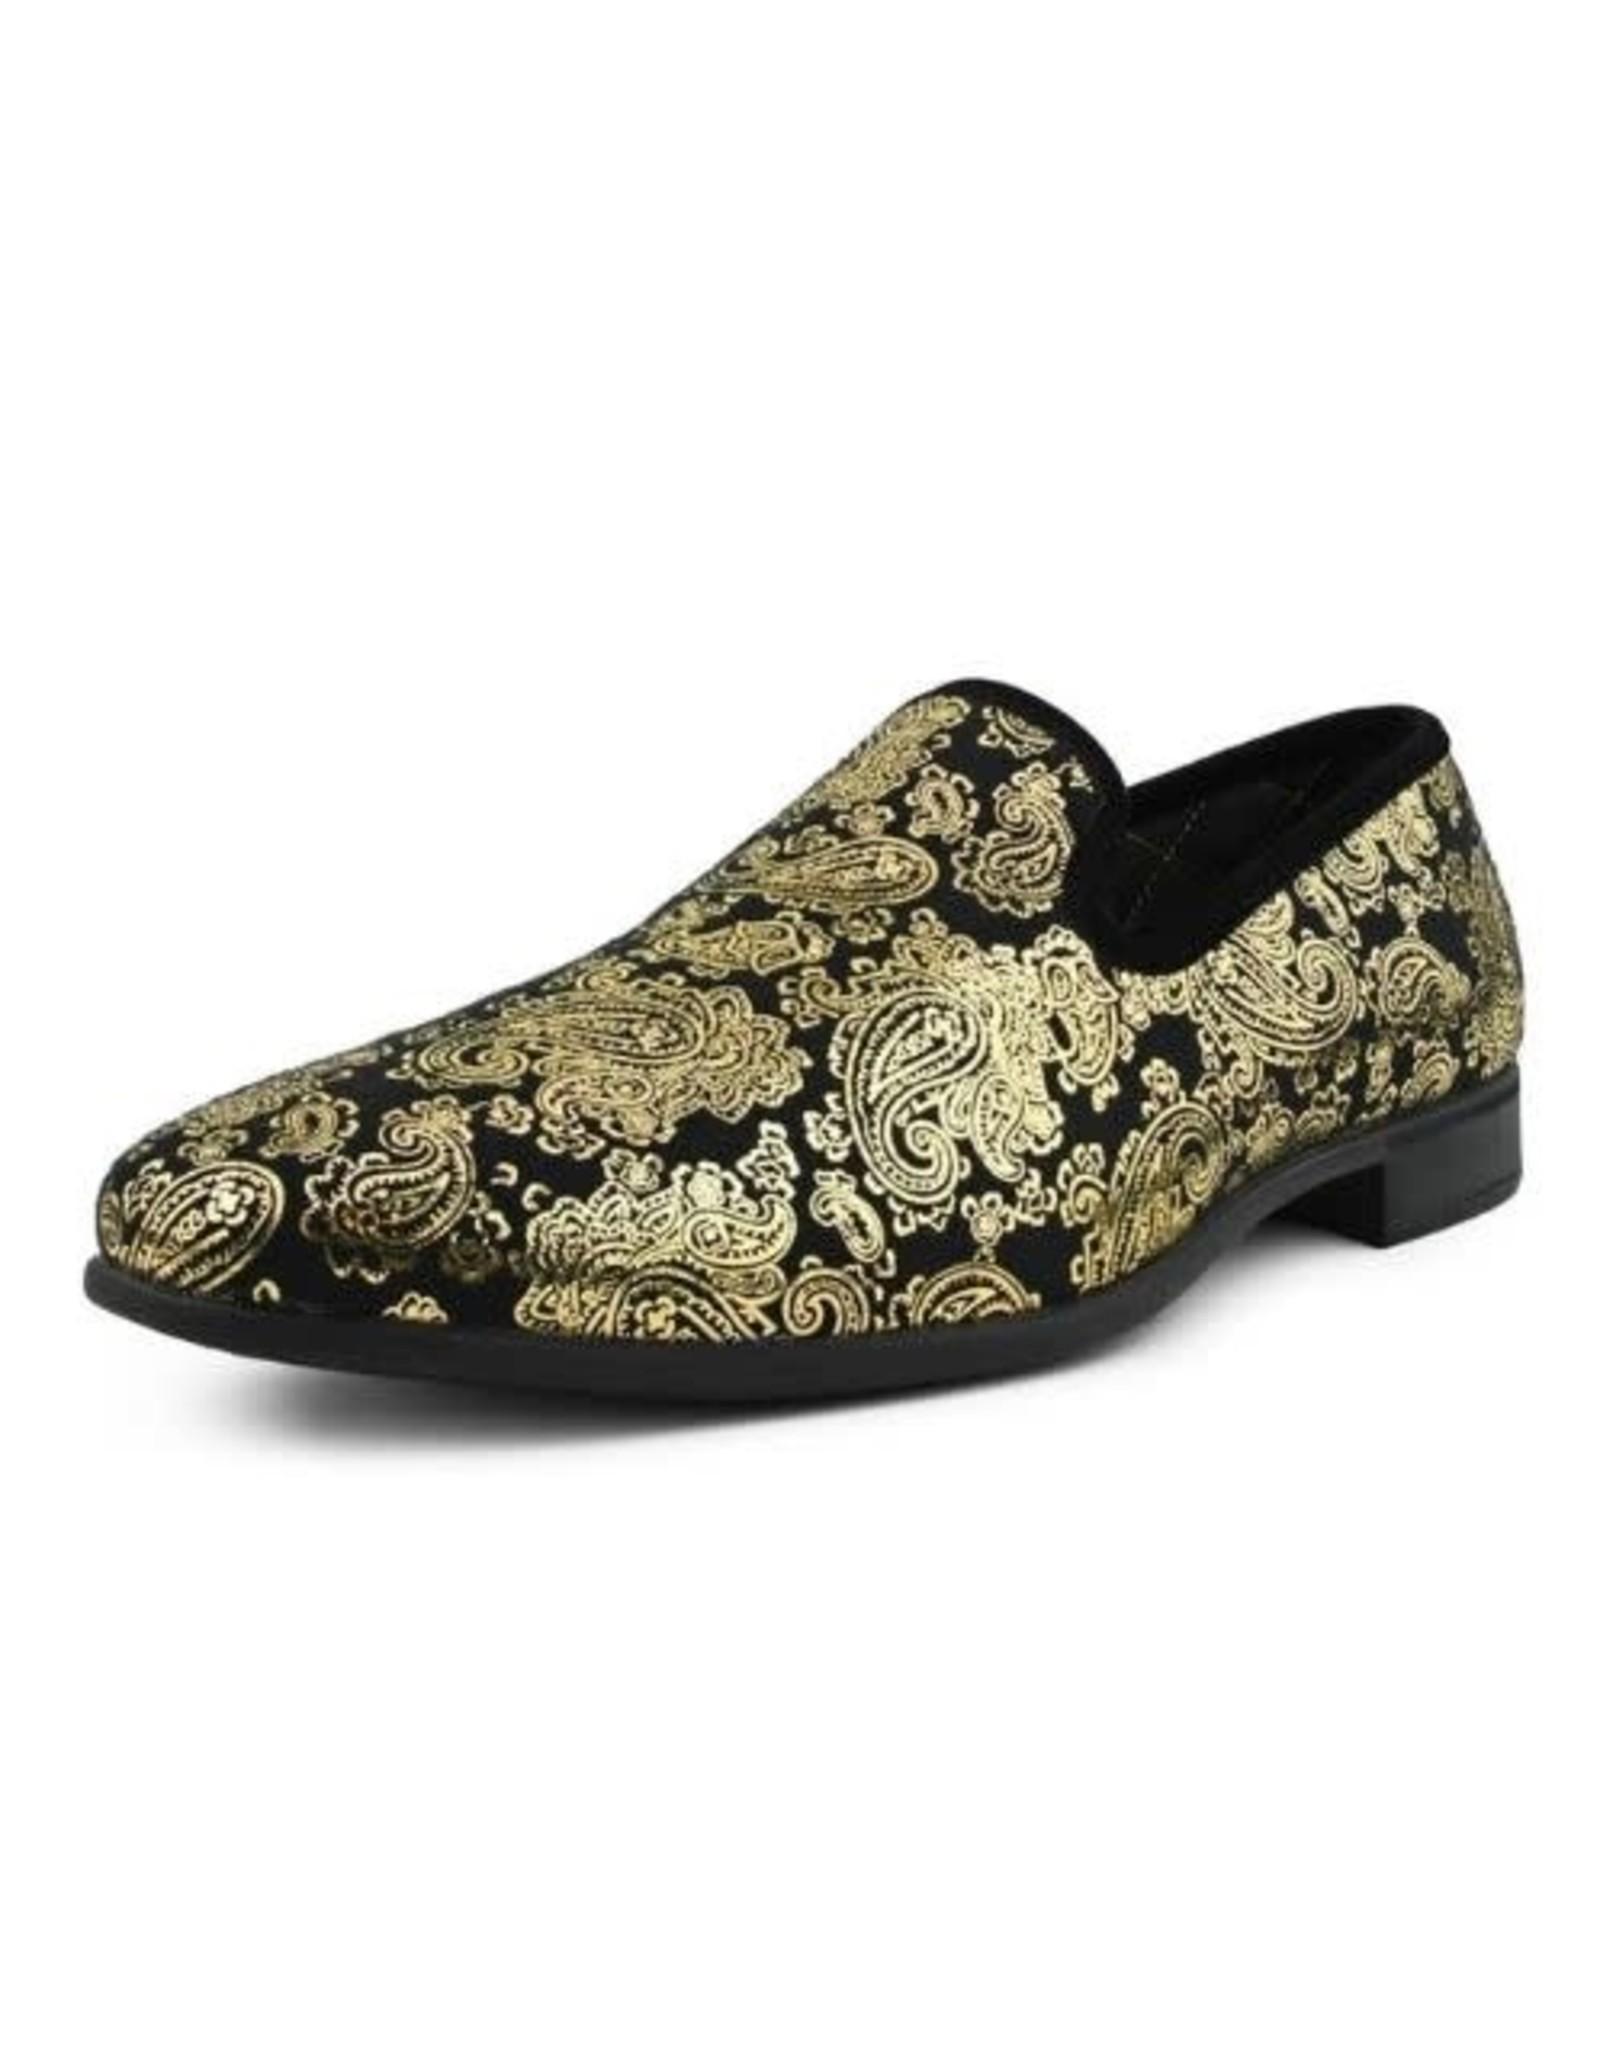 Amali Amali Keen Formal Shoe - Gold/Black